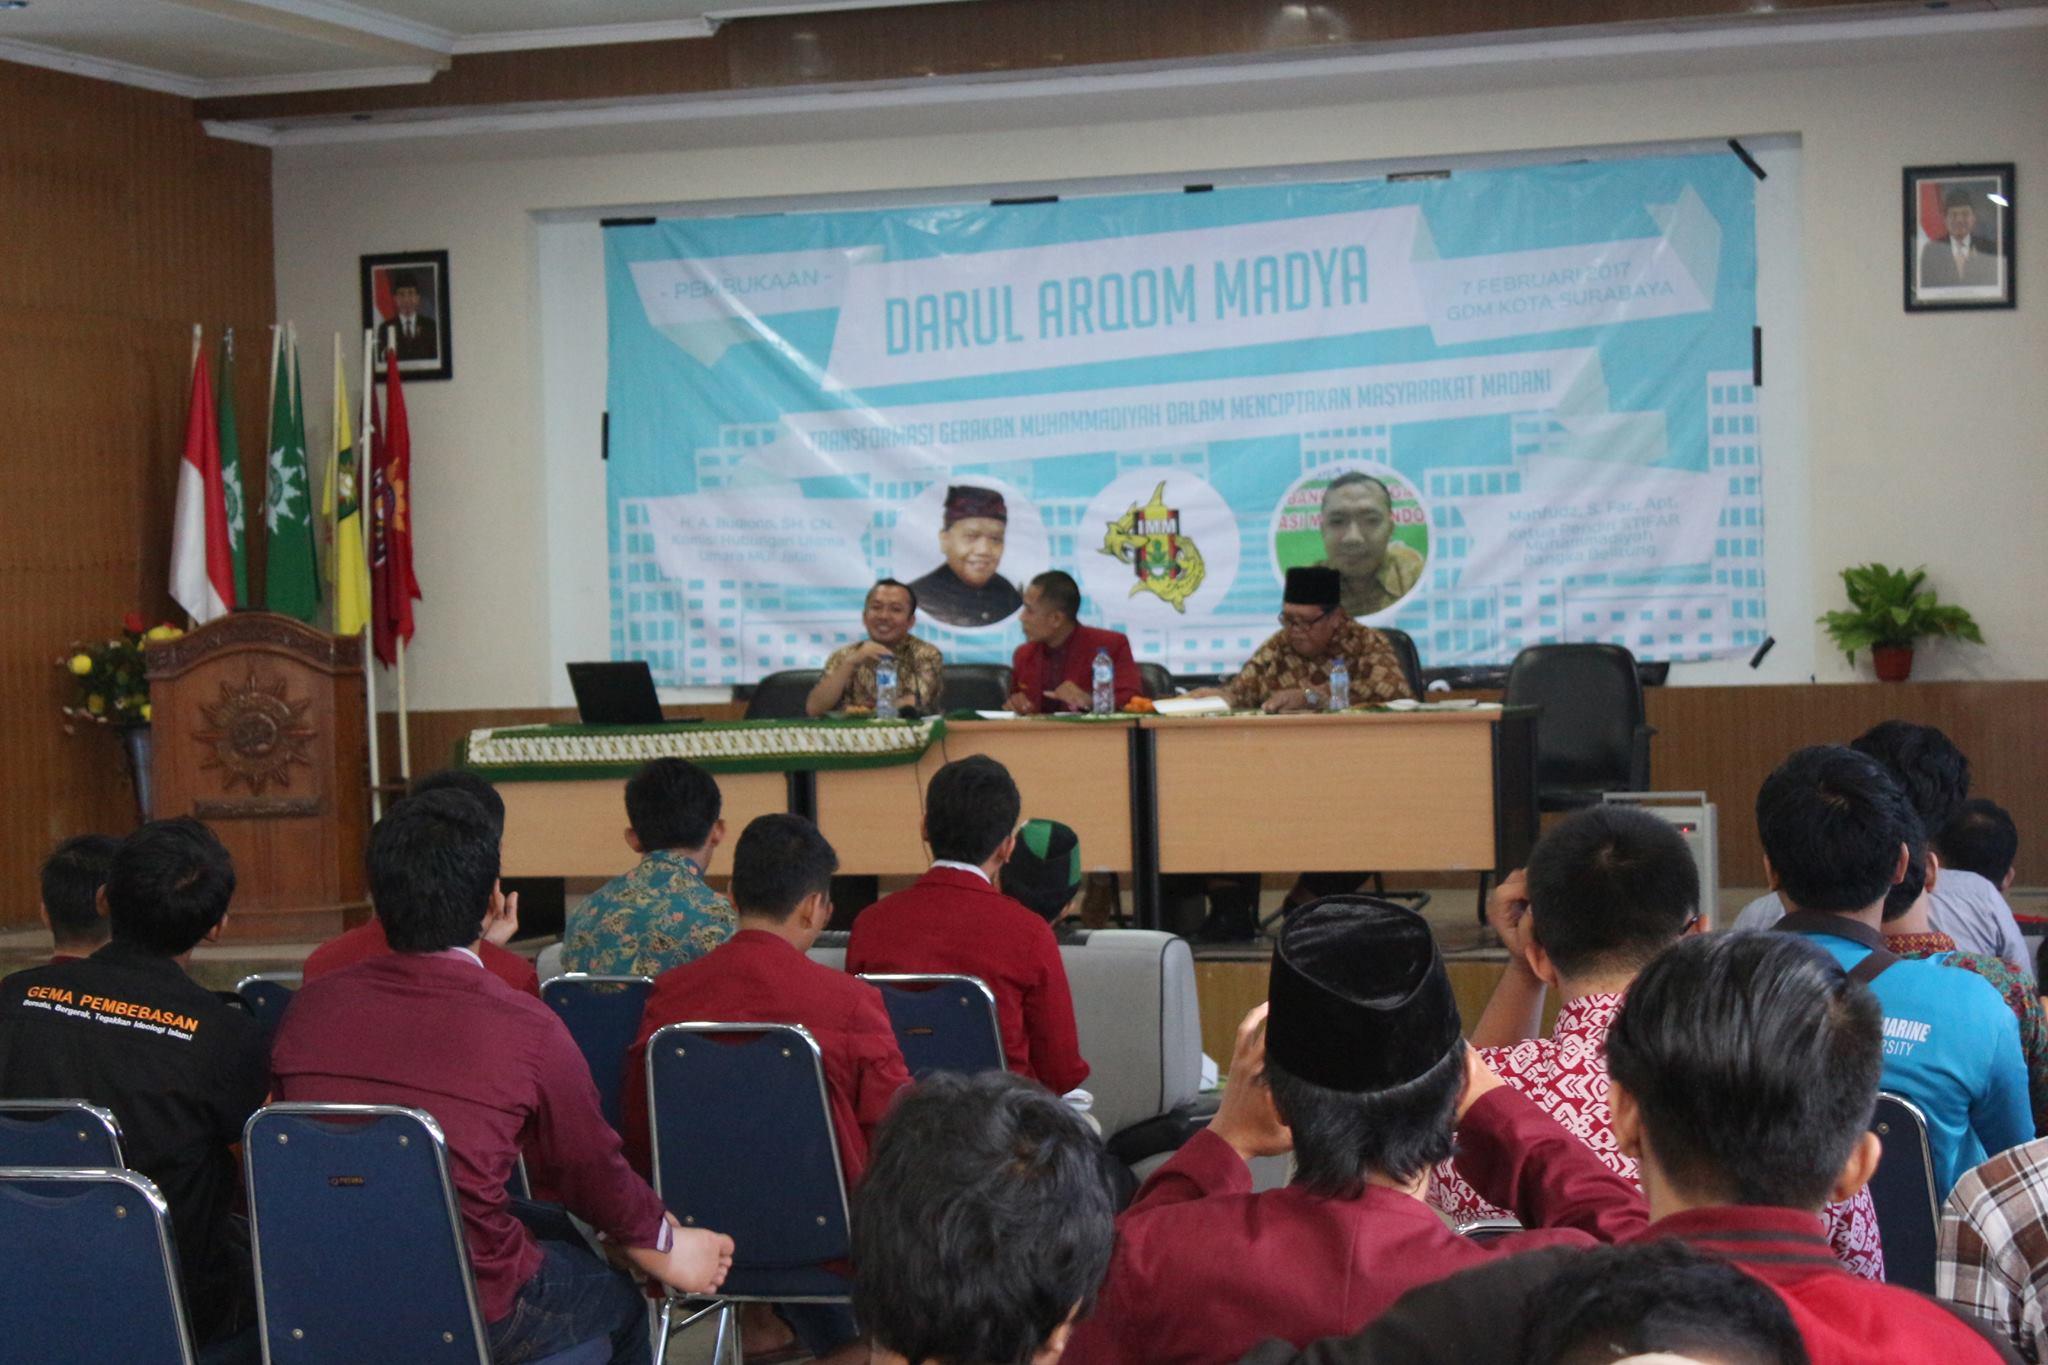 IMM Kota Surabaya Mengupayakan Lahirnya Kader Madani Melalui Darul Arqom Madya